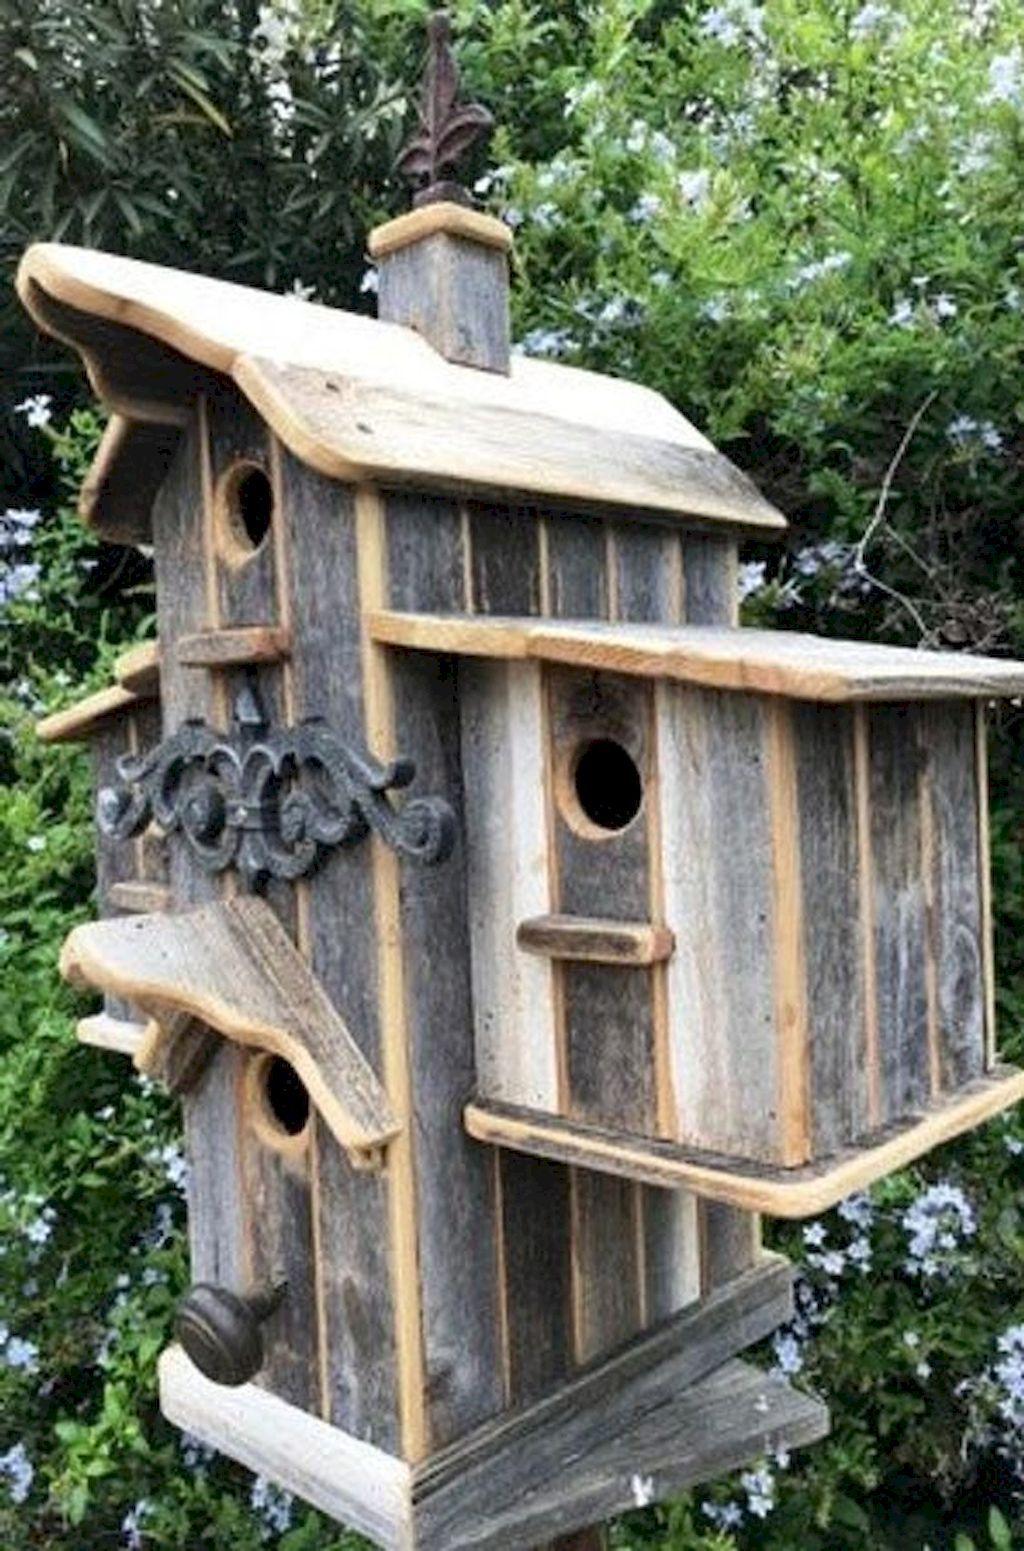 Gorgeous 60 Birdhouse Ideas To Make Your Garden More Beautiful Https Architeworks Com 60 Birdhouse Ideas To Make Yo Unique Bird Houses Bird Houses Bird House